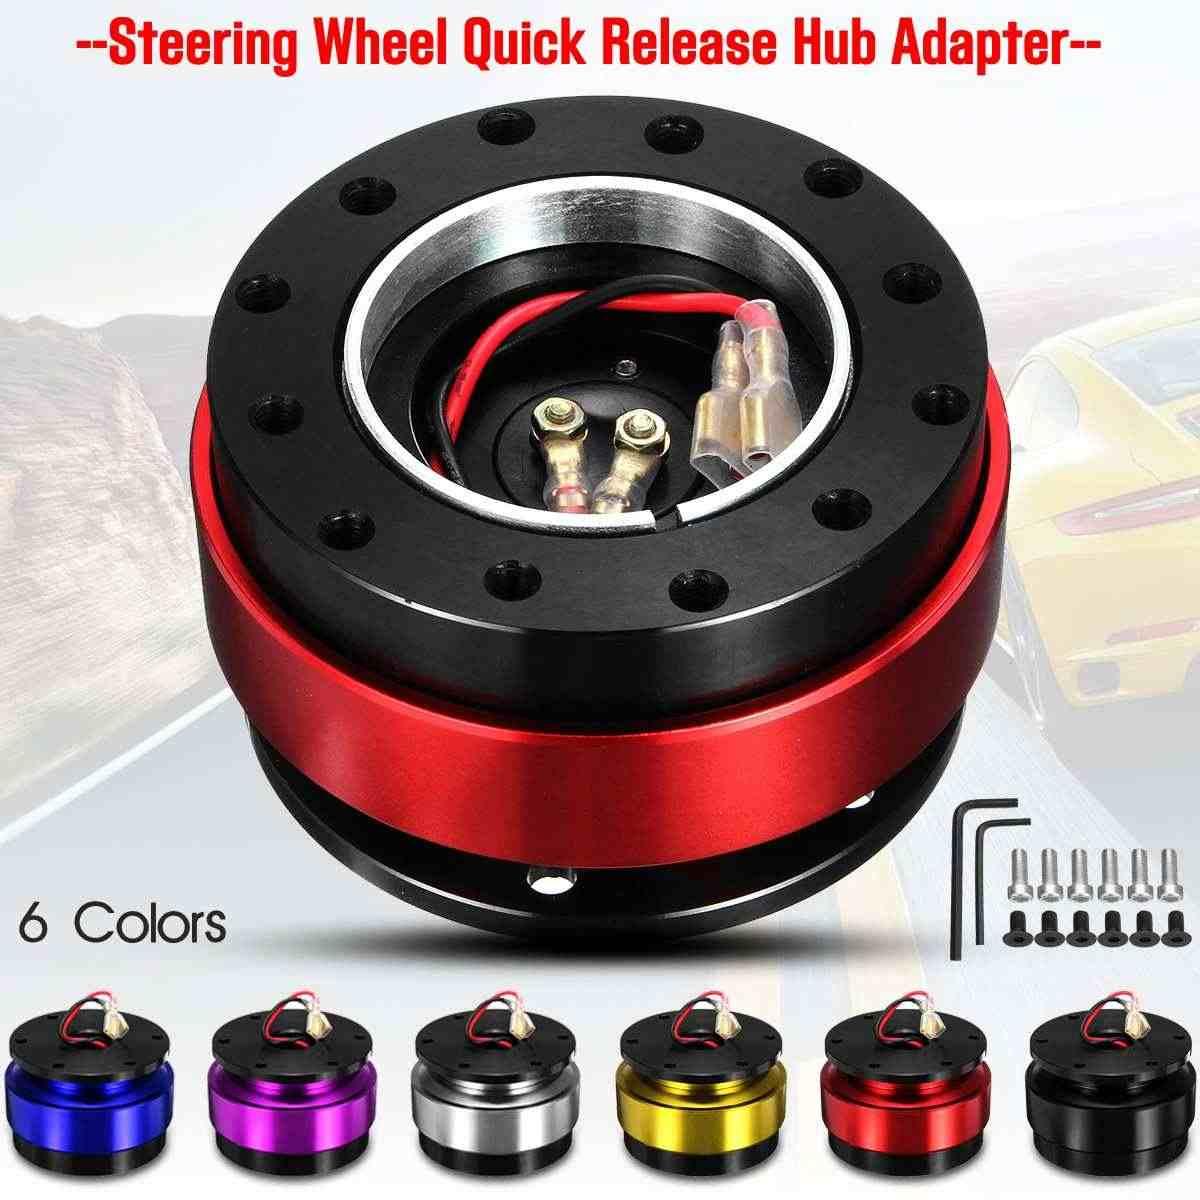 without Car Steering Wheel Aluminum Boss Kit Racing Hub Adapter For TOYOTA Car Steering Wheel Hub Adapter Color : Black